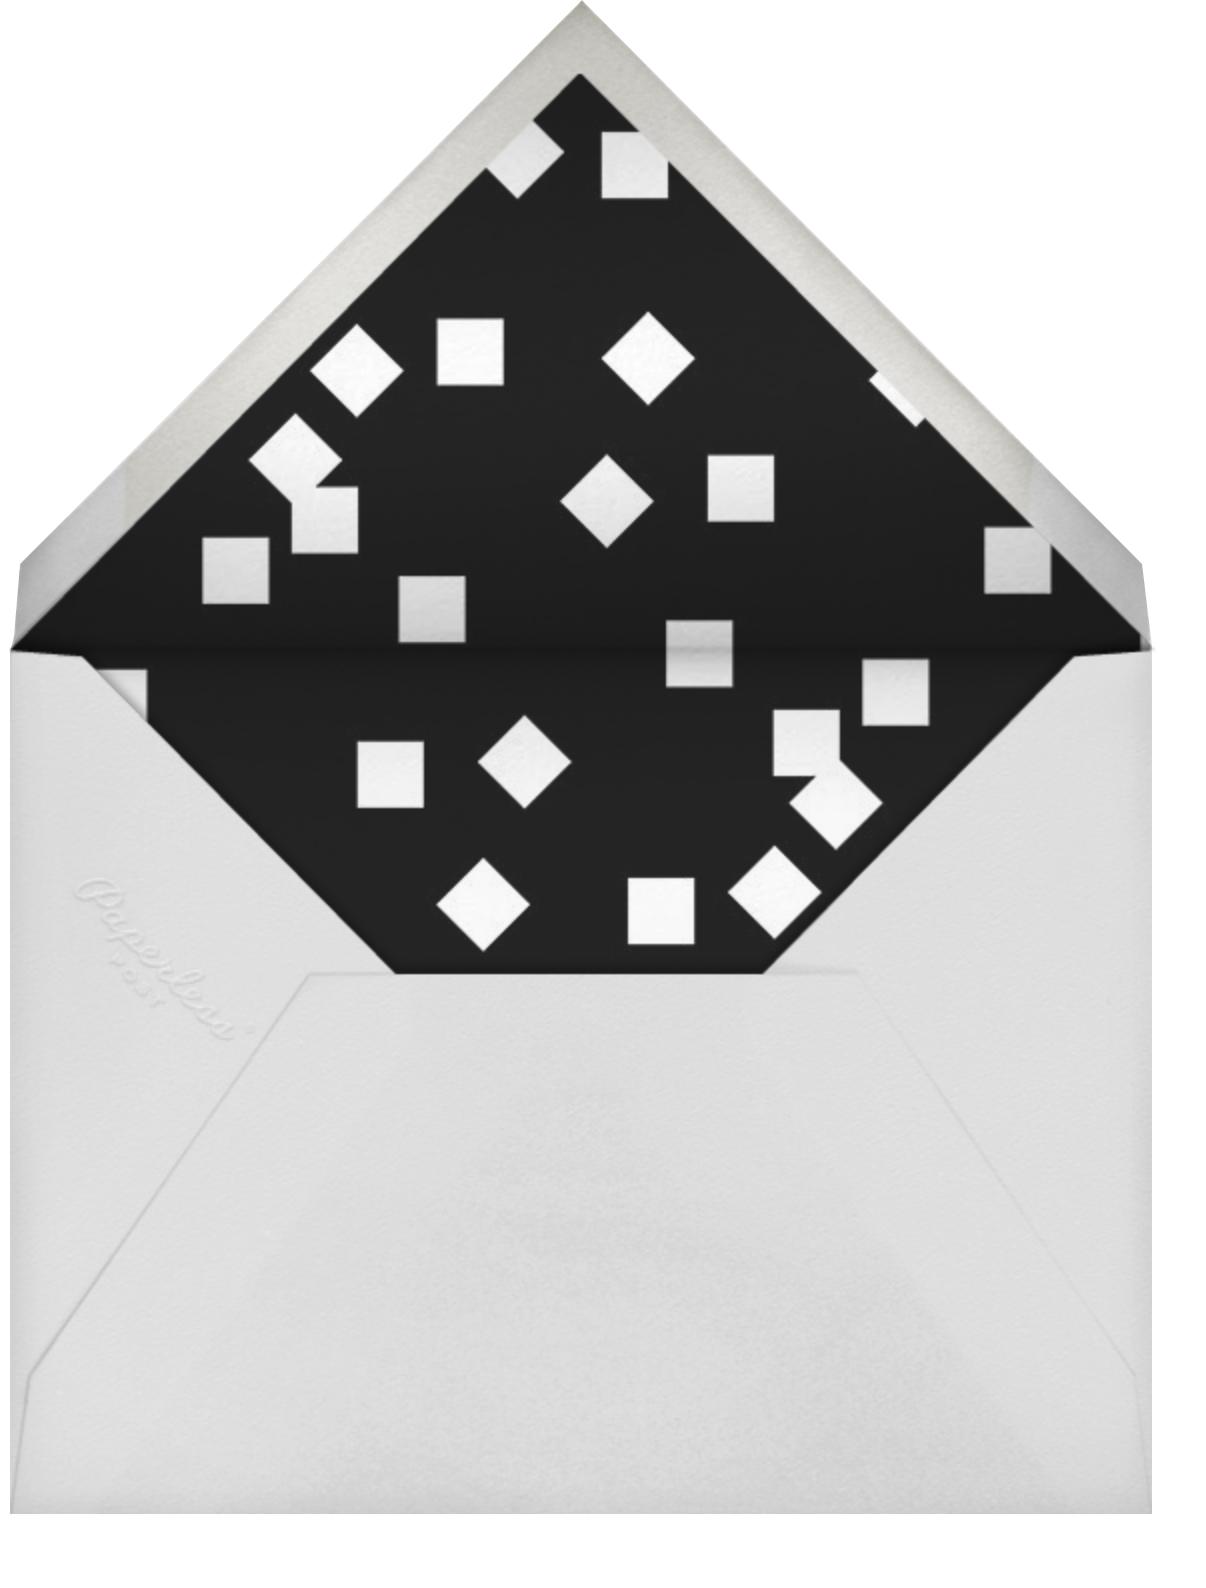 Placard - Silver - Paperless Post - Envelope